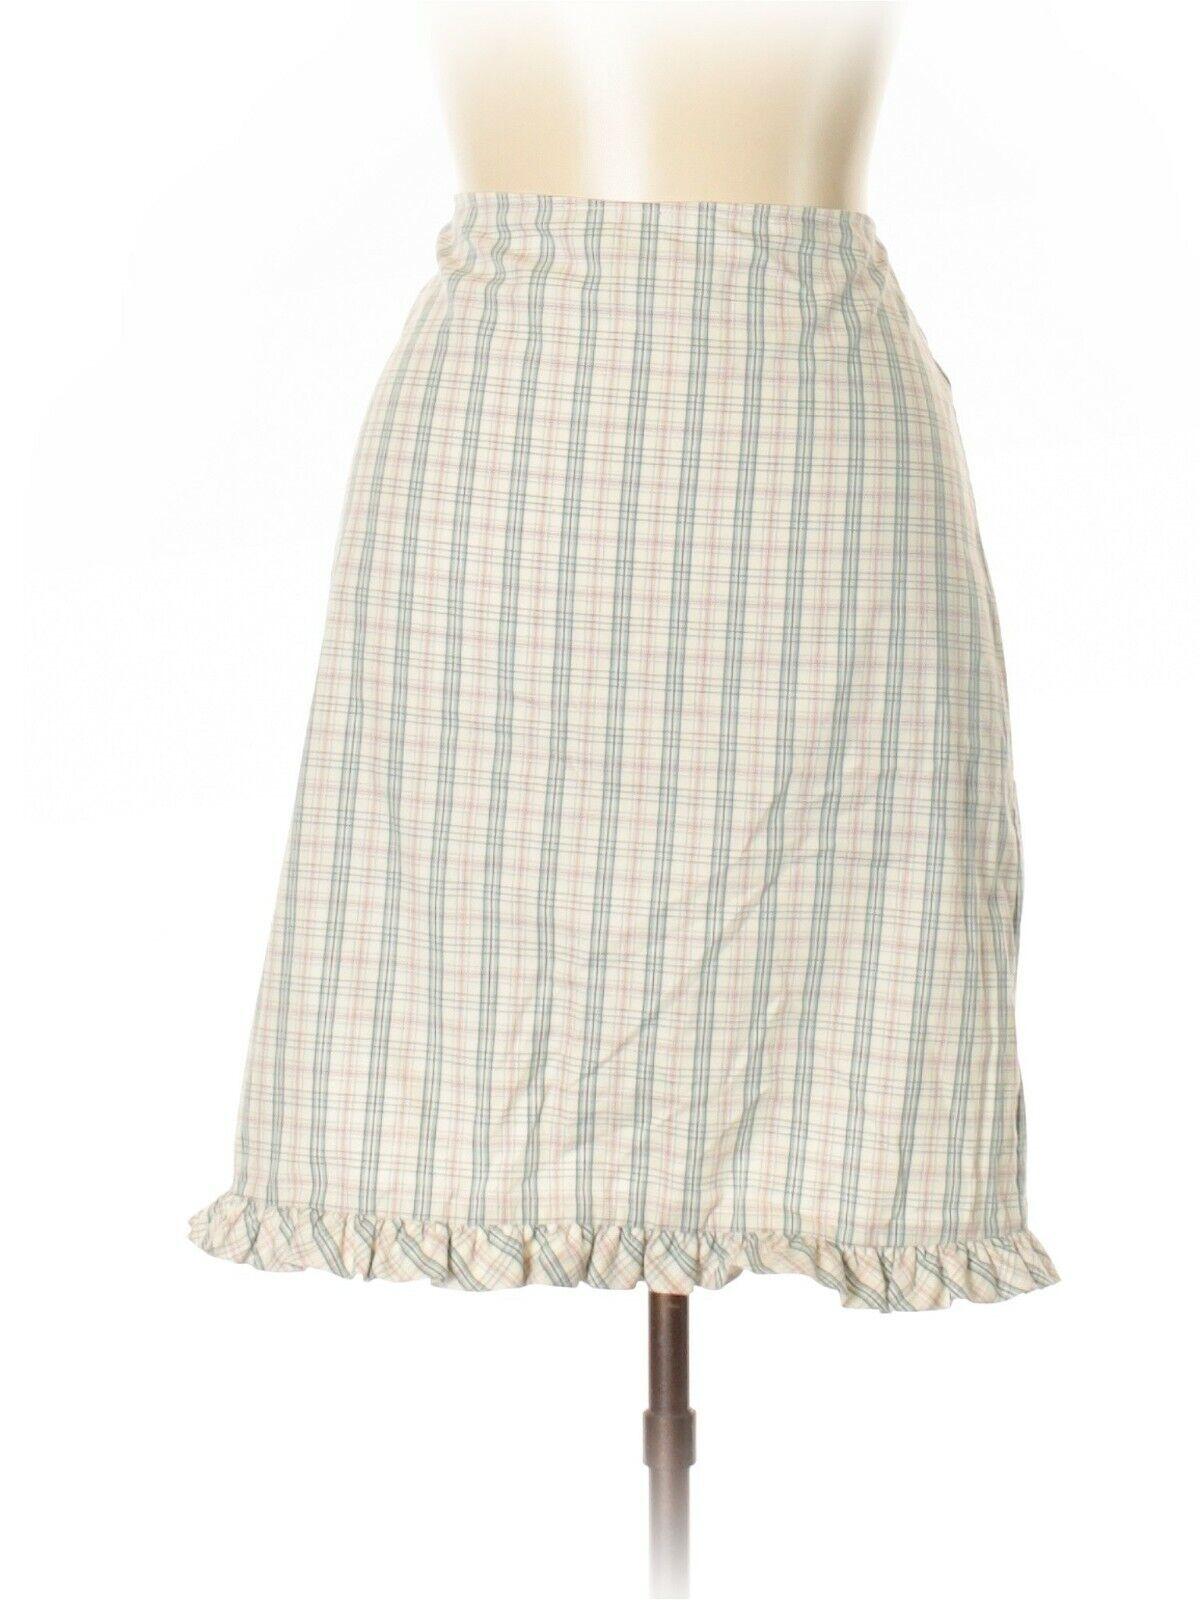 Marni White Plaid A-Line Skirt, Size 8 (US) 42 (IT), NWT